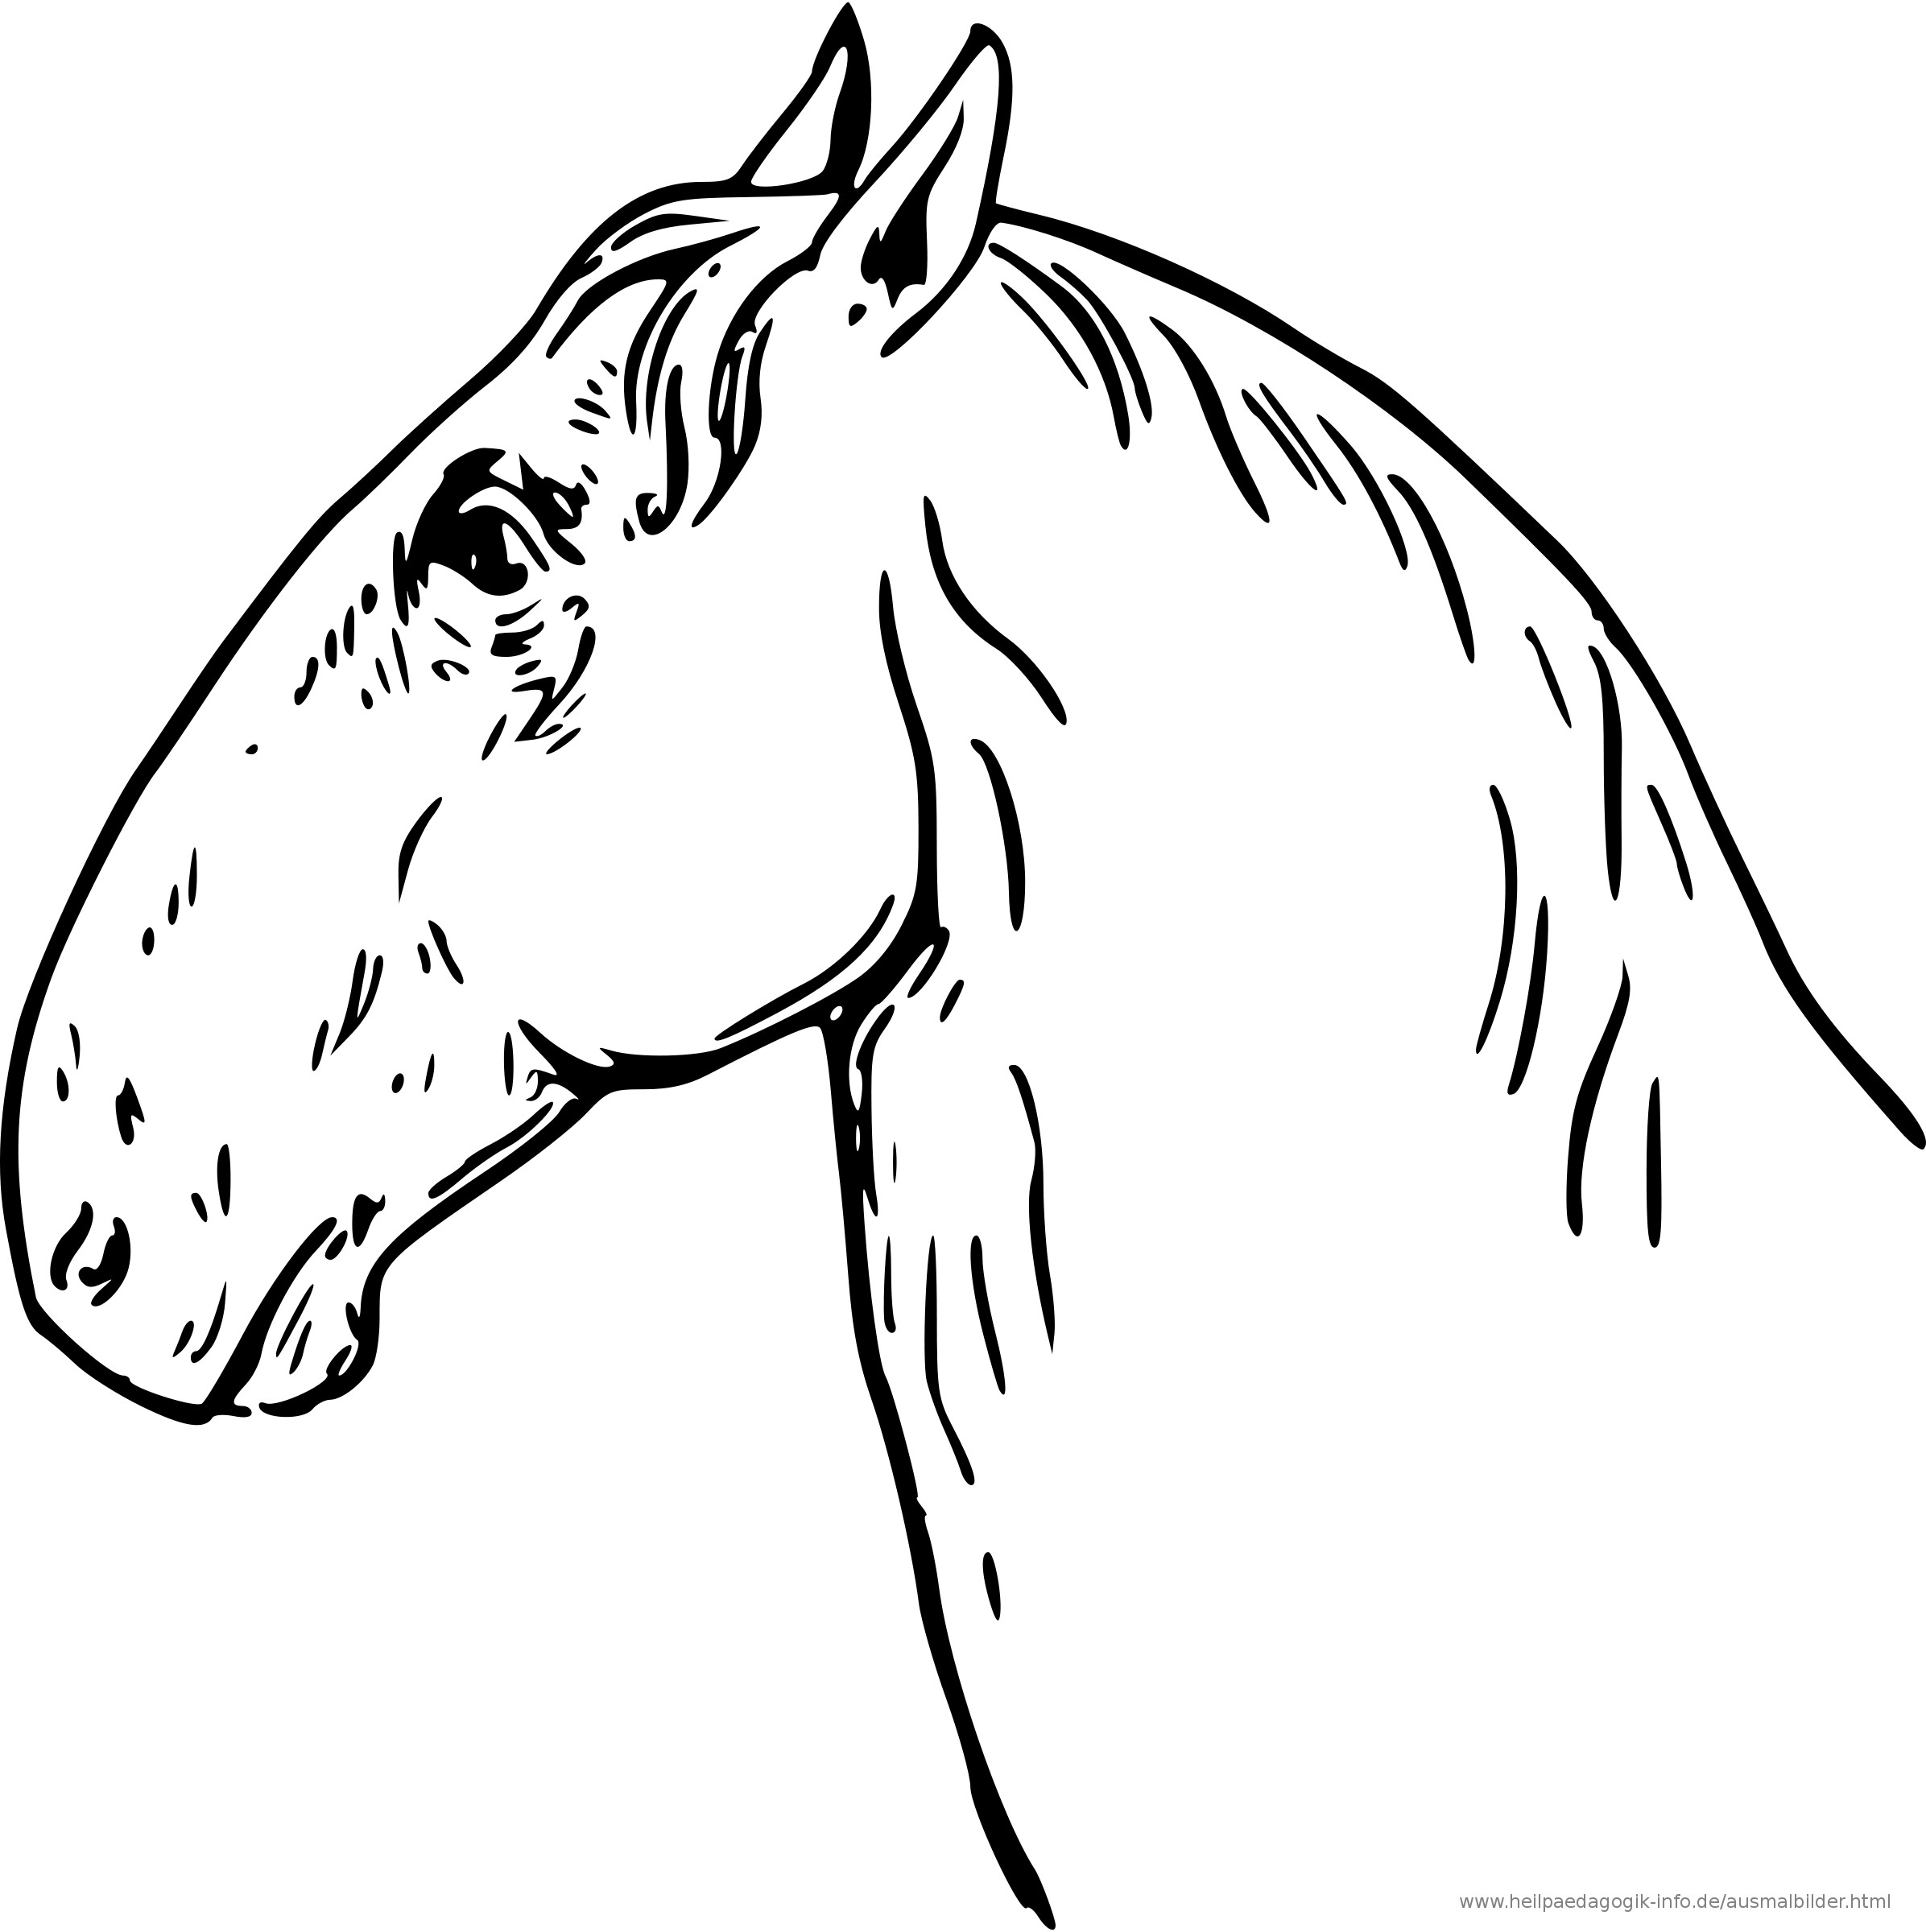 Pferdekopf Ausmalbilder  Ausmalbilder Pferde